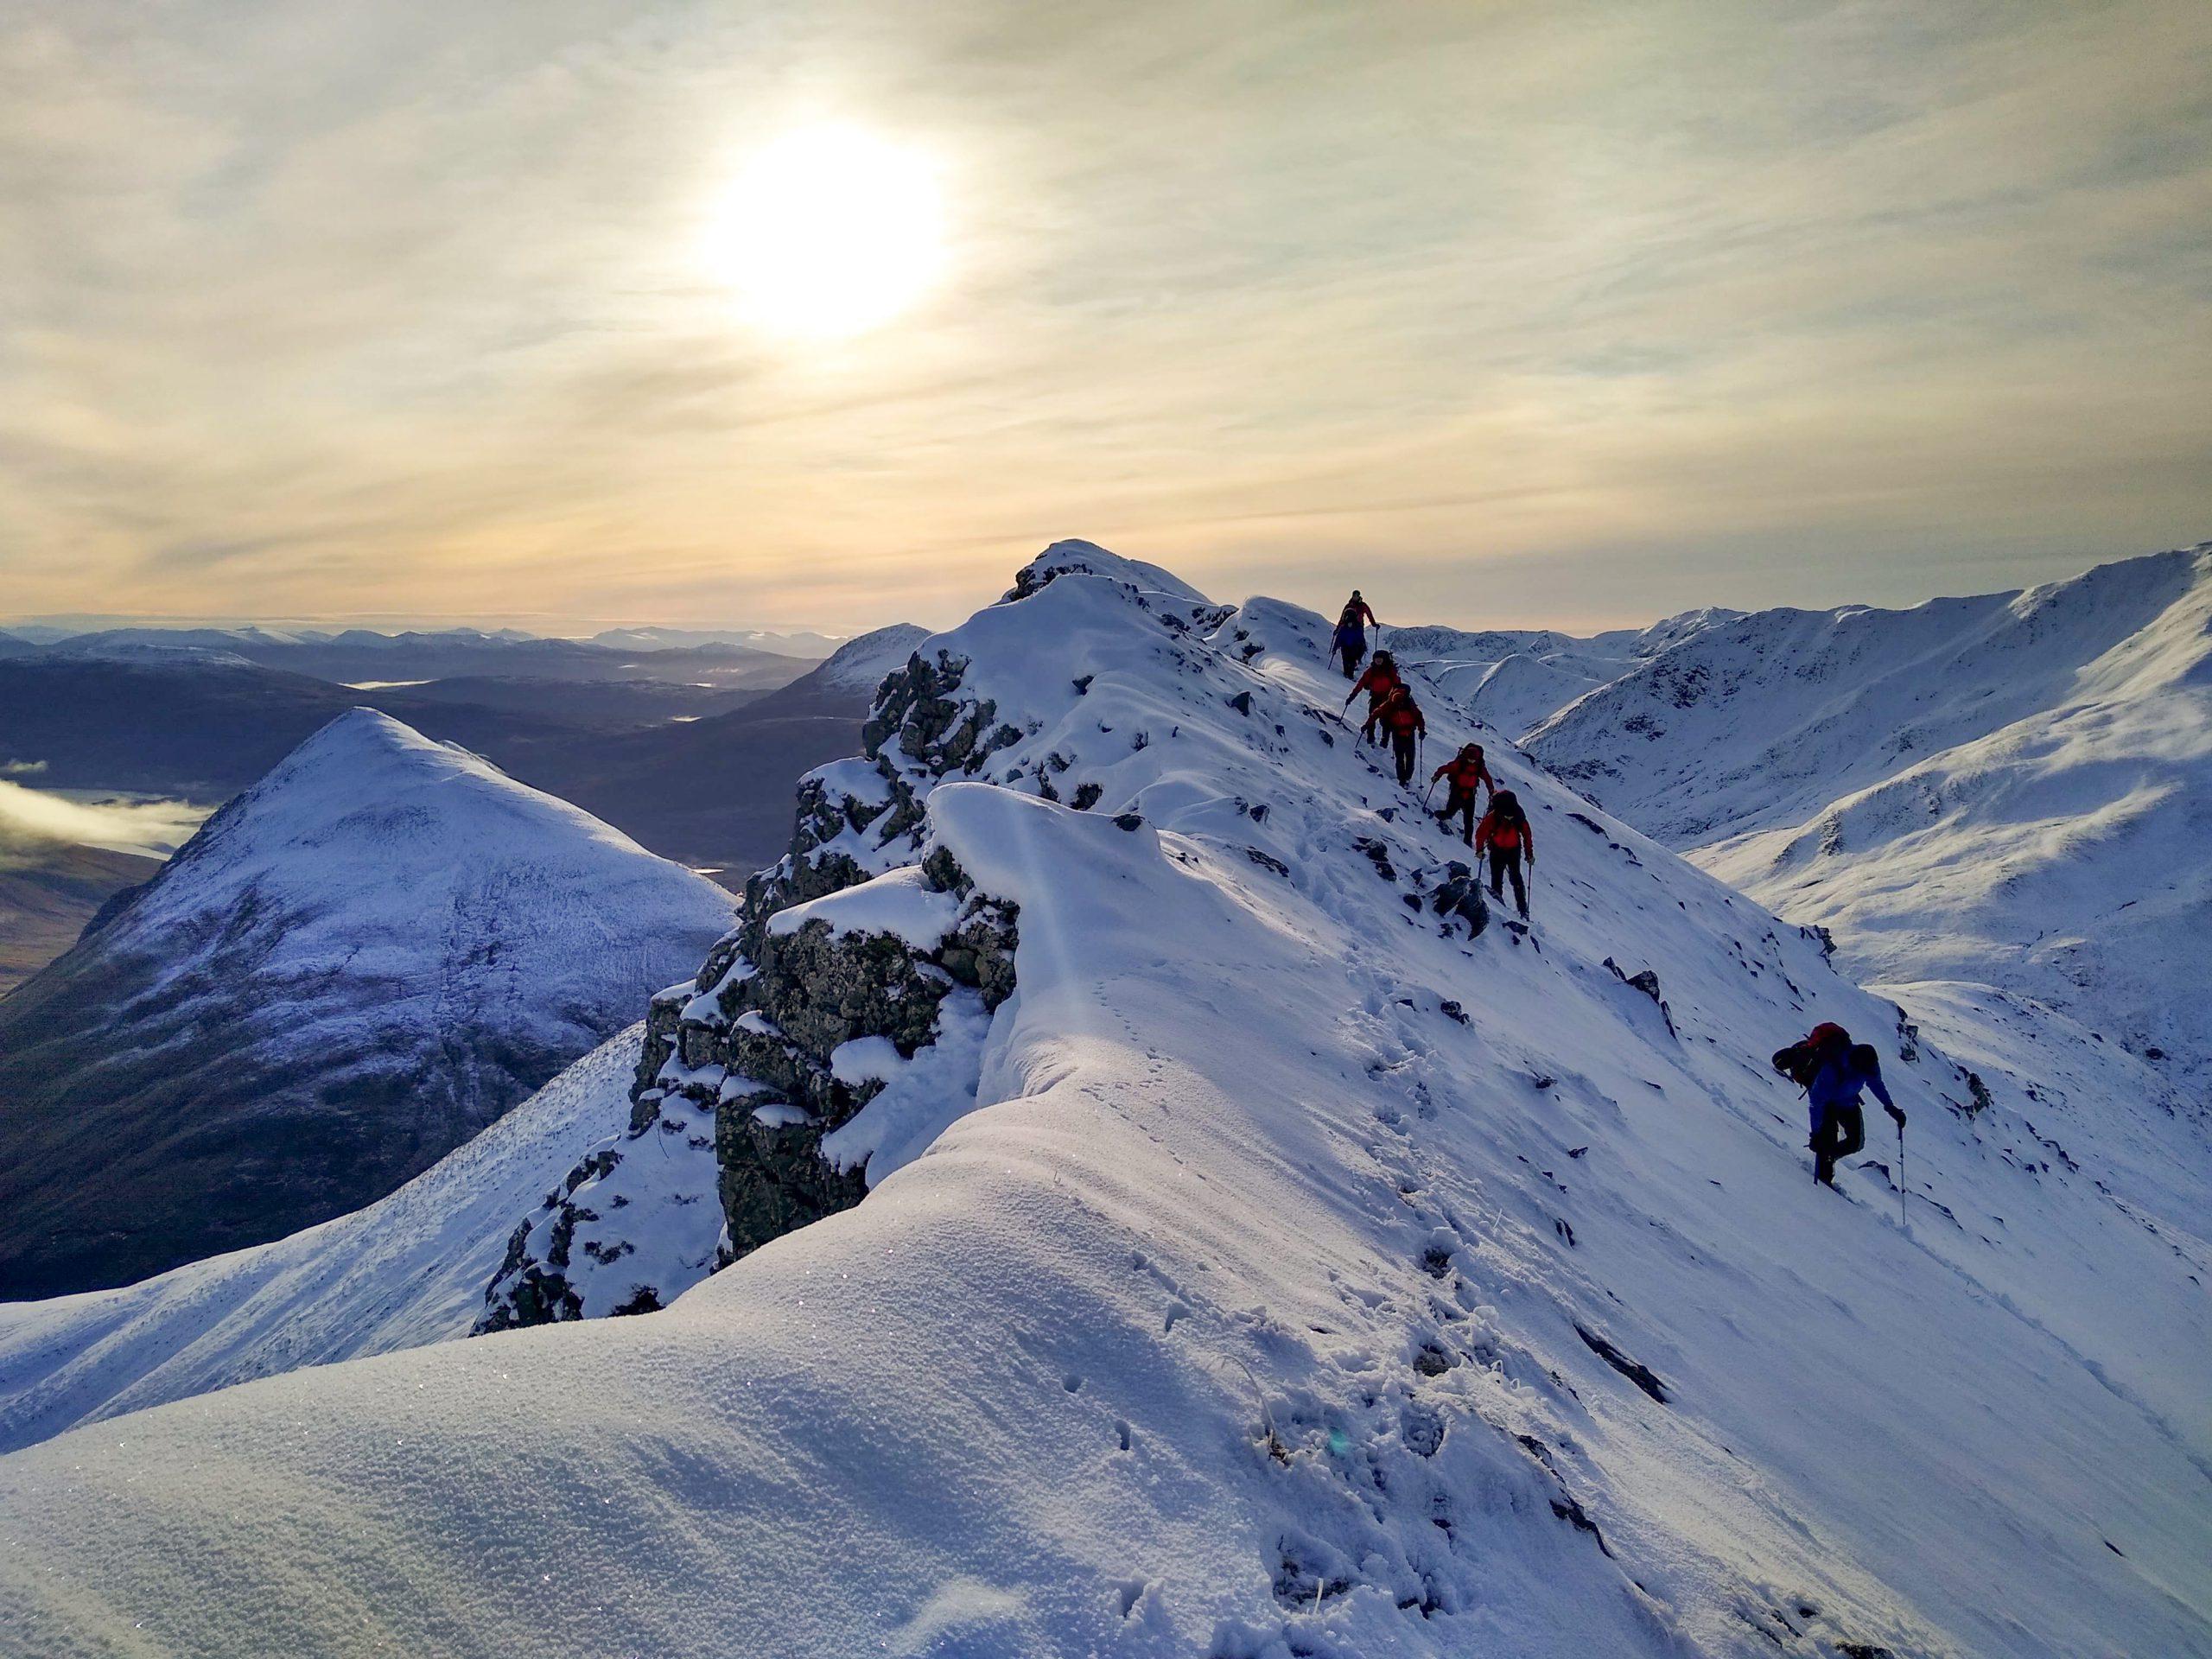 Traversing a ridge line in winter